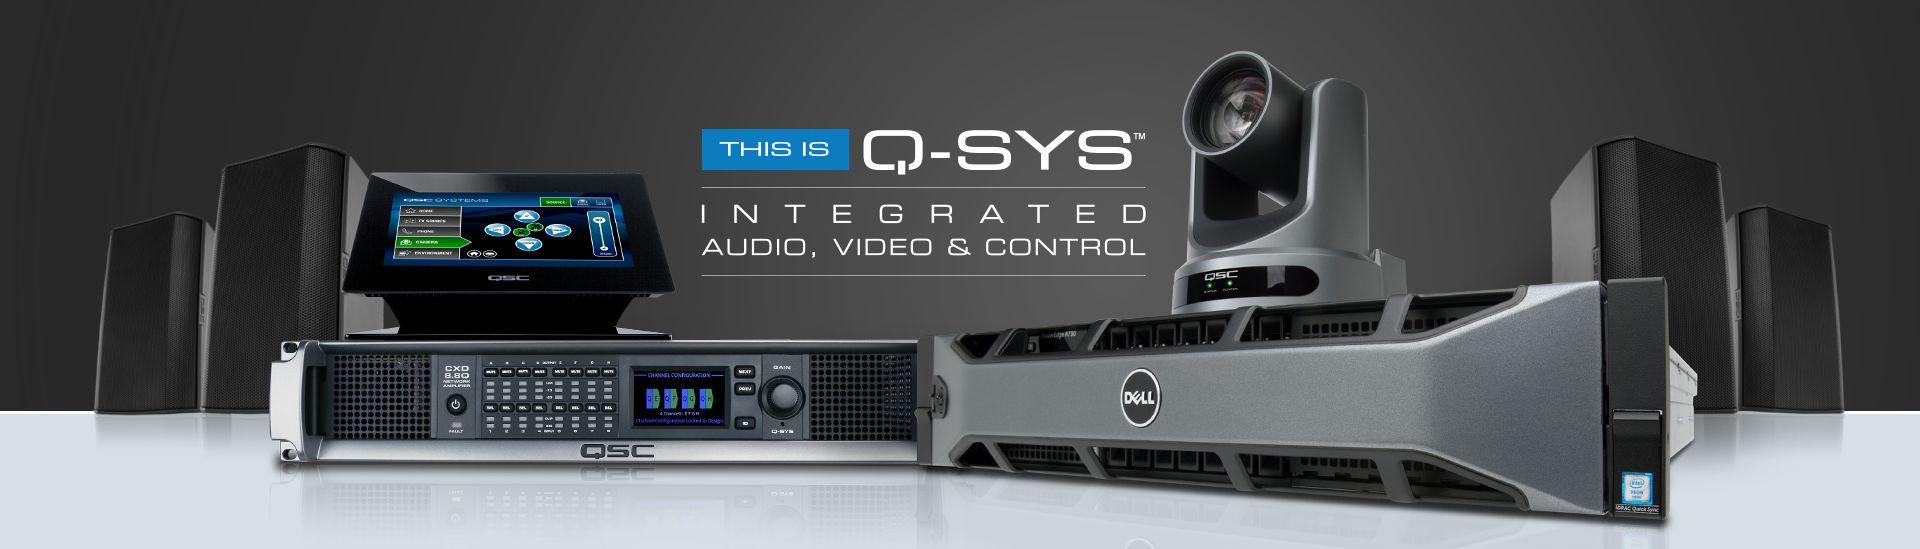 systems_qsysPlatform_slider1